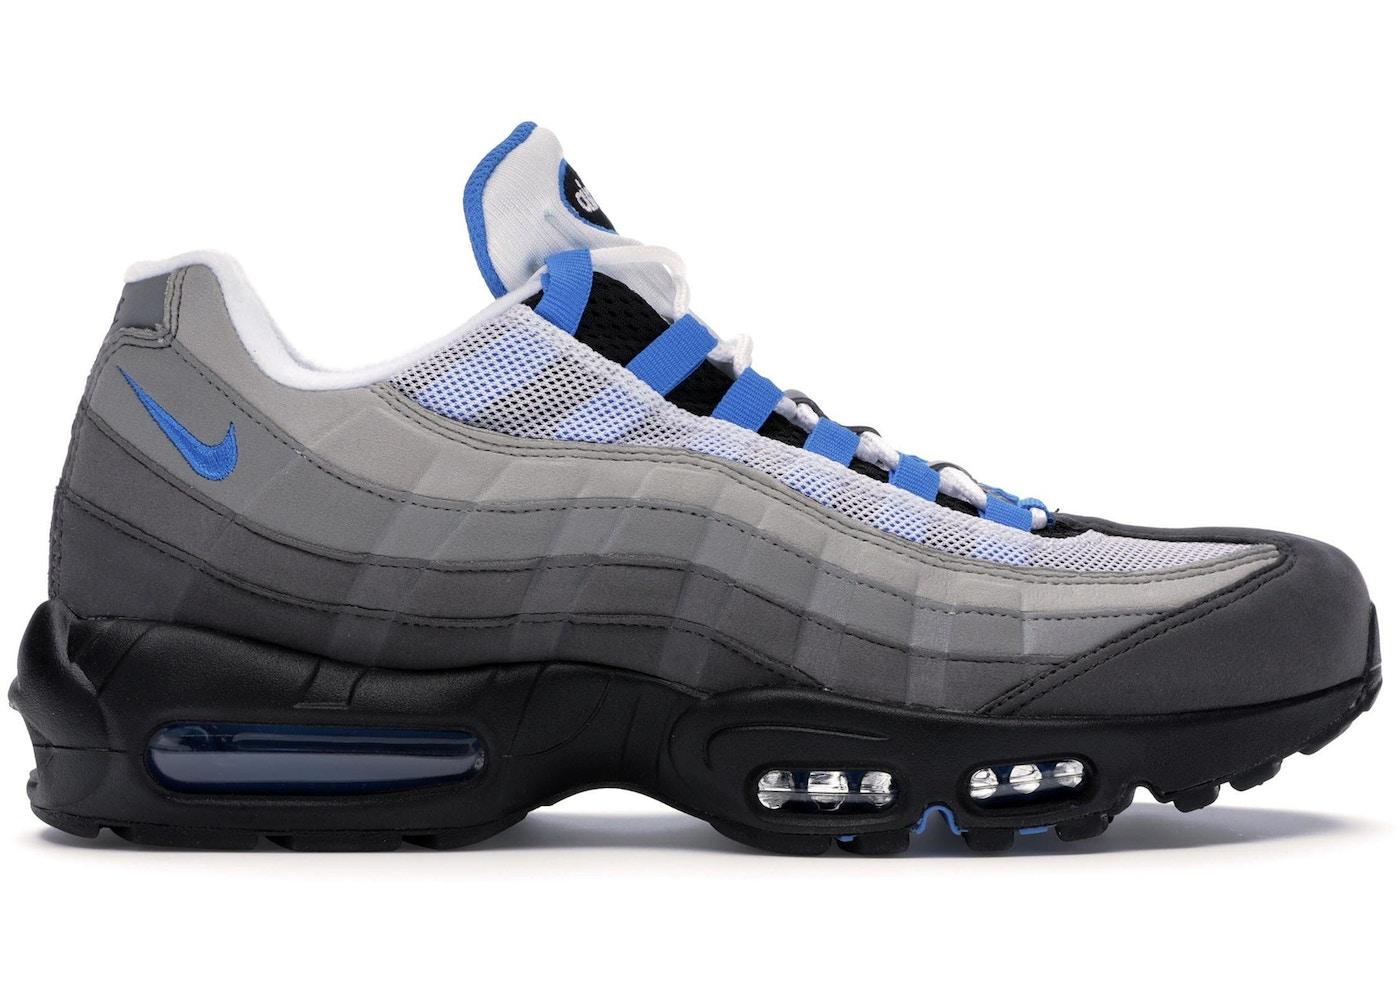 detailing 2516a 39daf Buy Nike Air Max 95 Shoes   Deadstock Sneakers